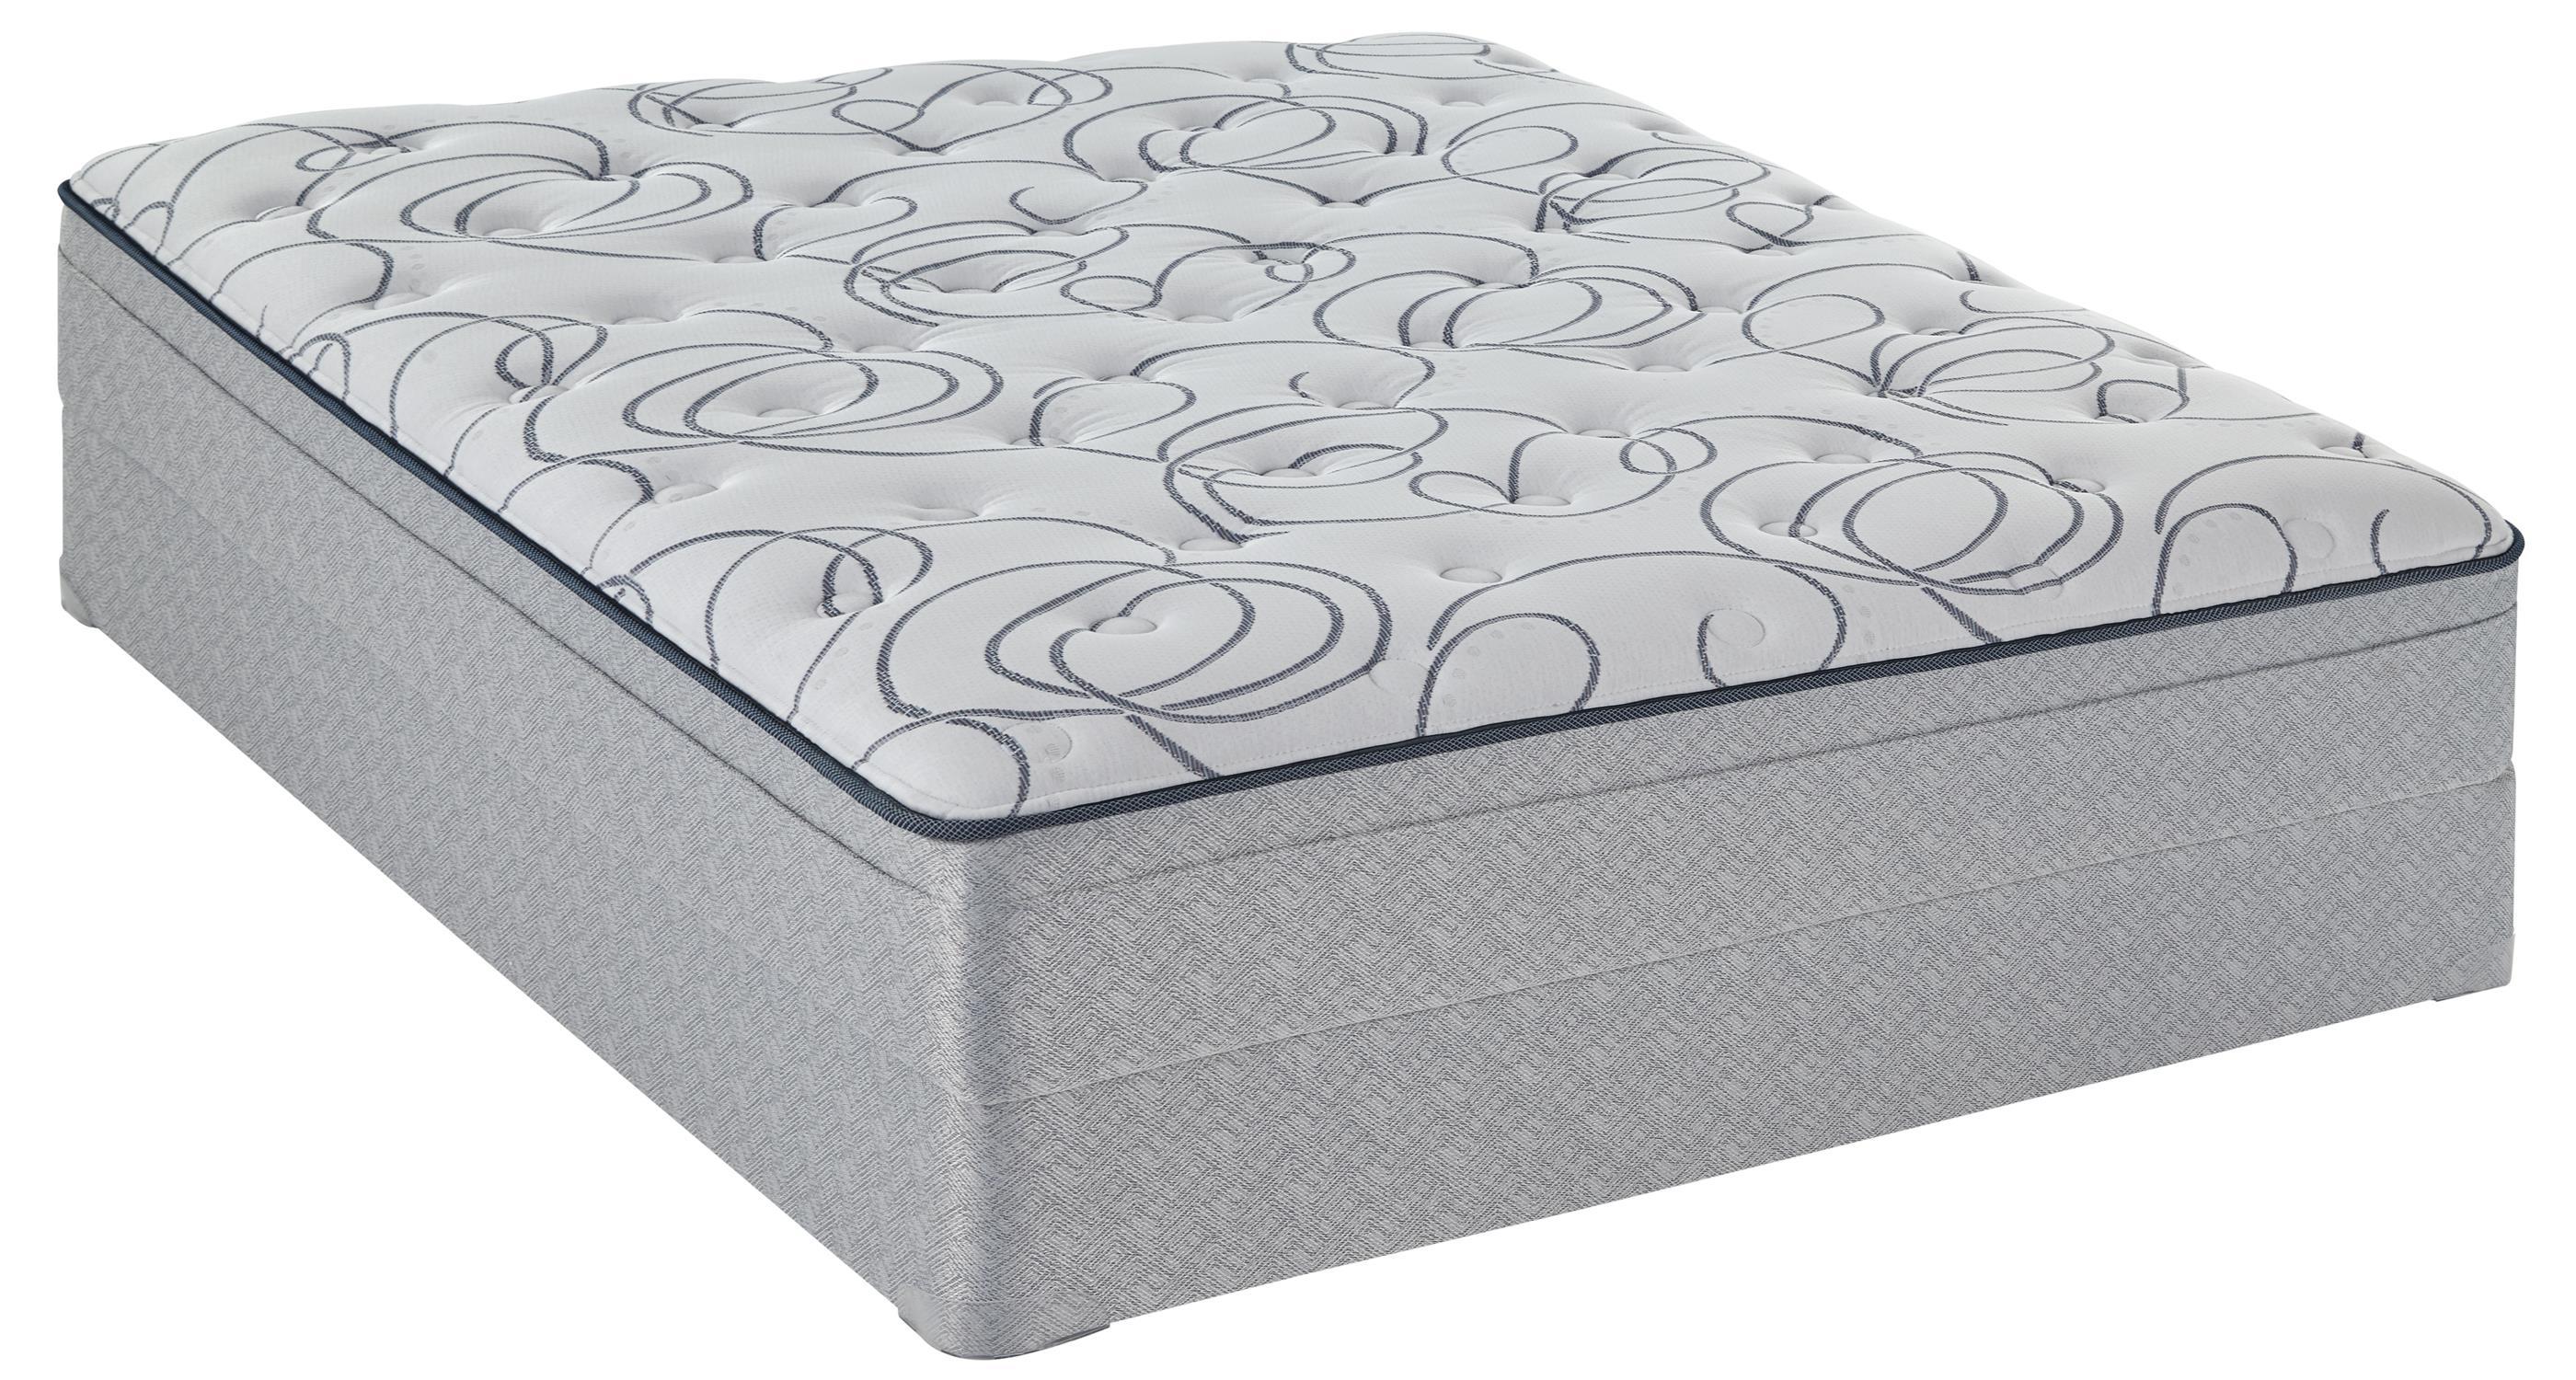 Sealy Turnbridge King Plush ET Mattress Set - Item Number: PlushET-K+2xFoundationK